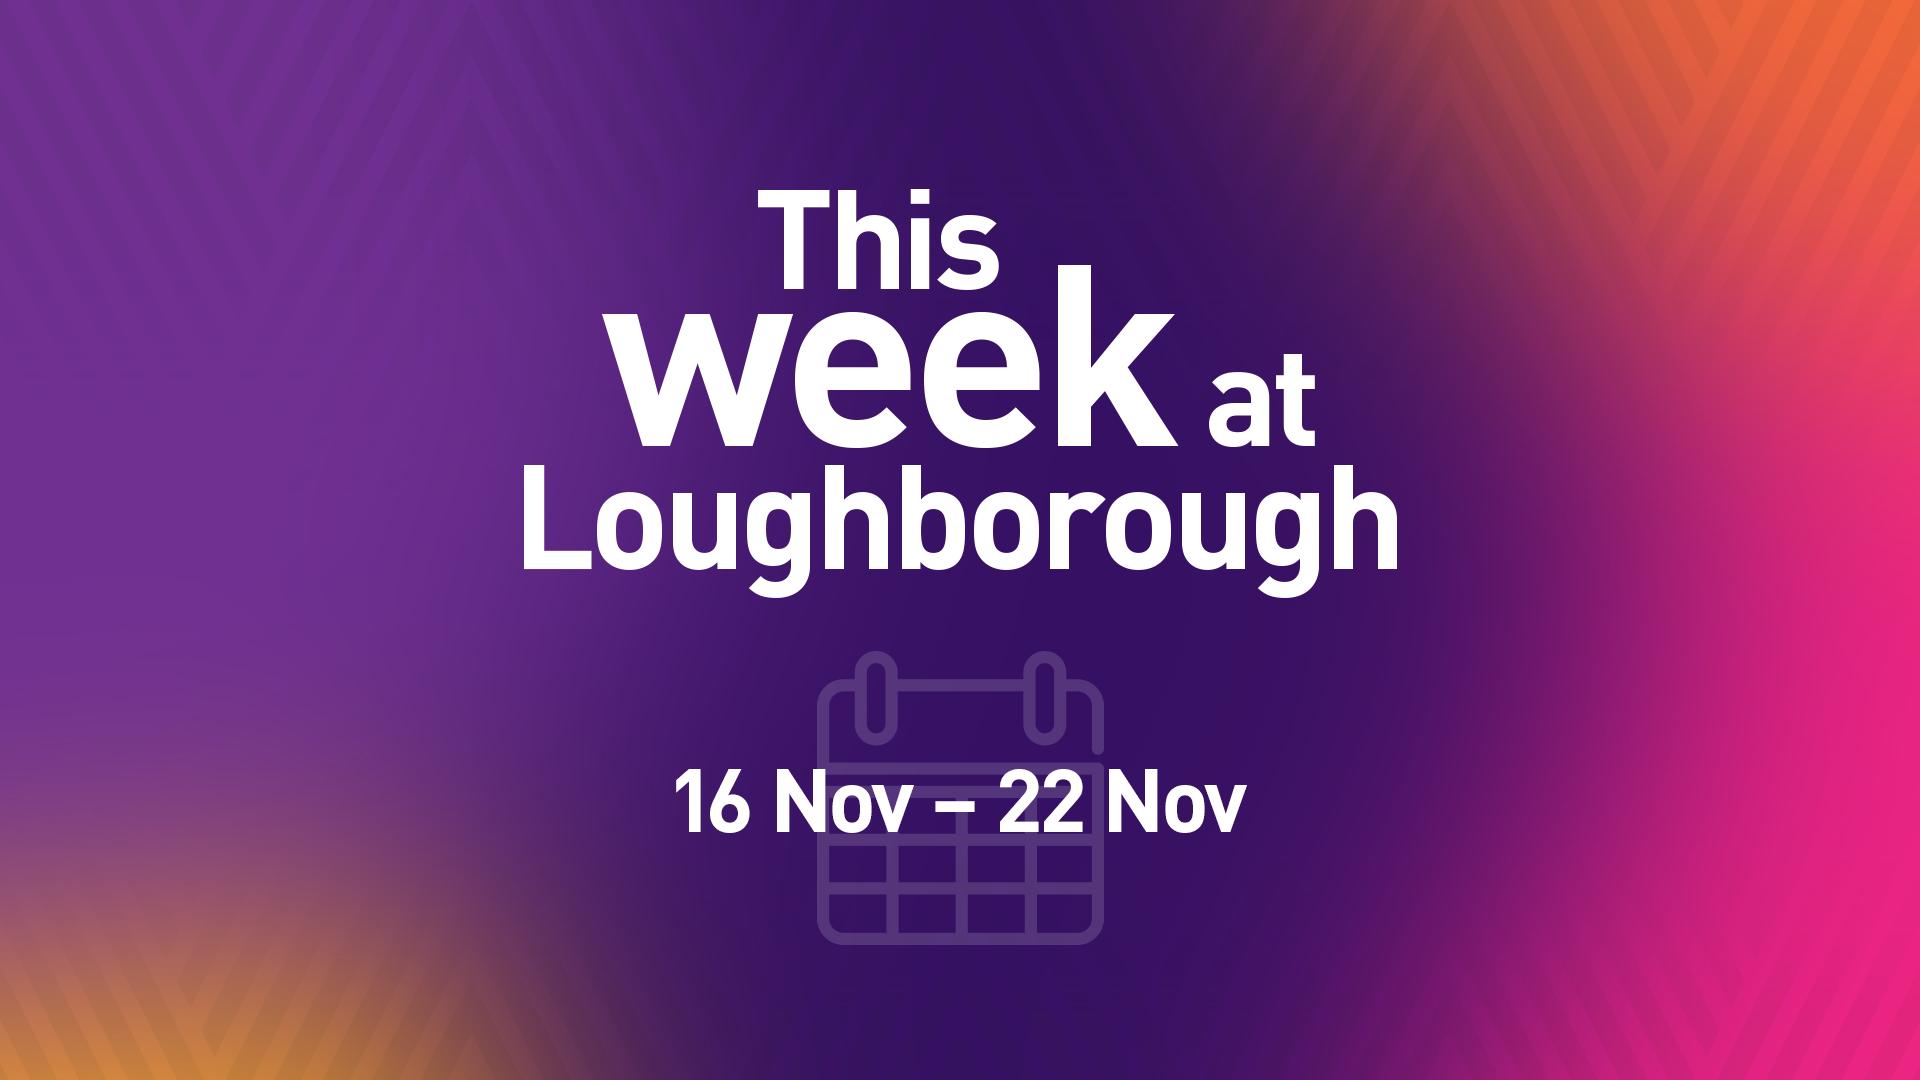 This Week at Loughborough | 16 November